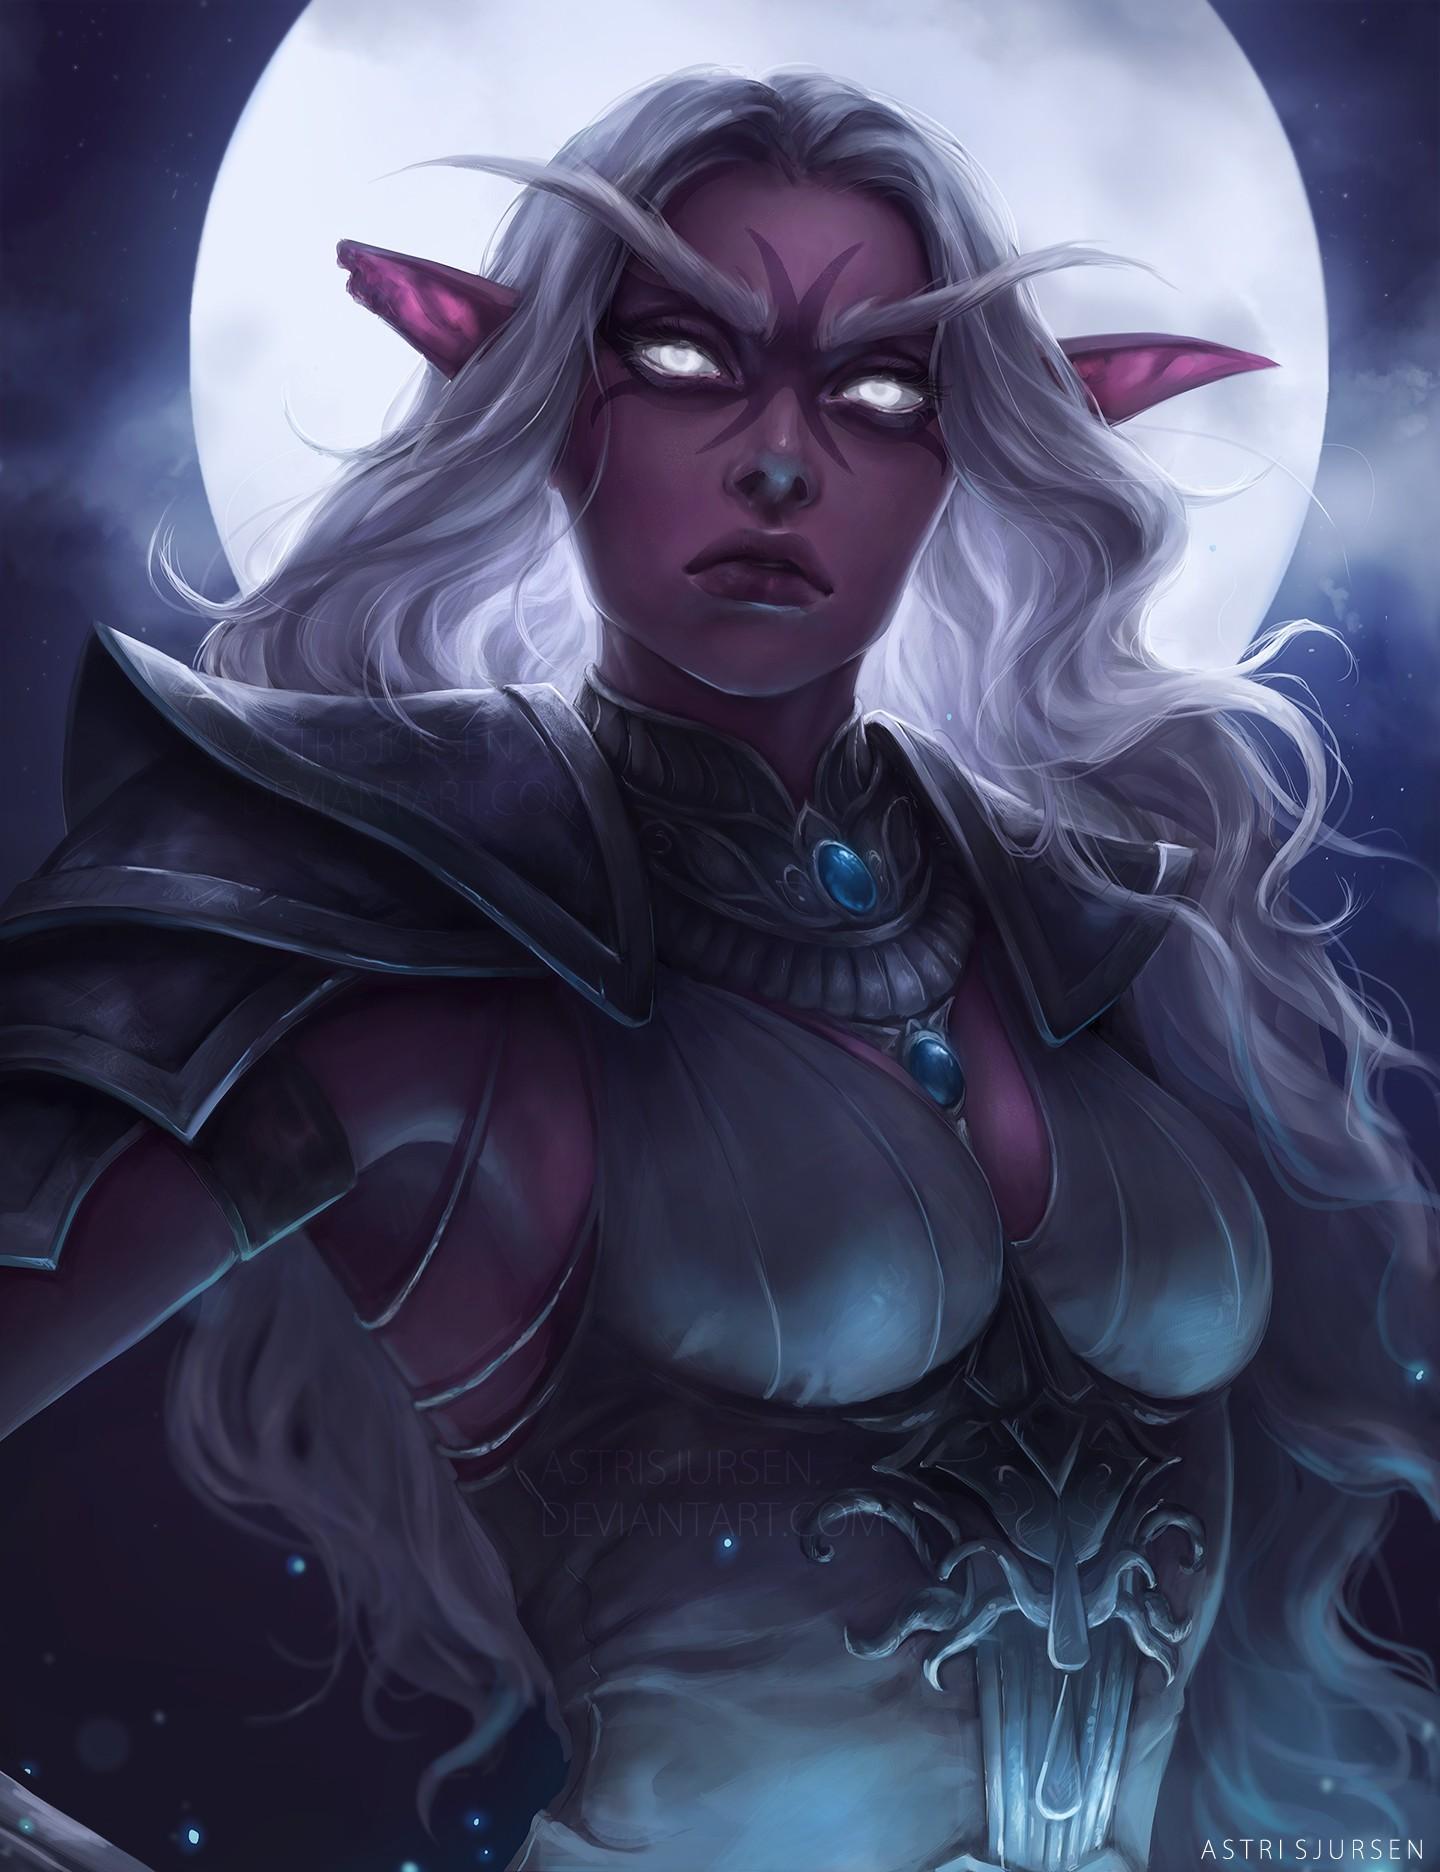 Wallpaper Cg Artwork Woman Warrior Mythology Fictional